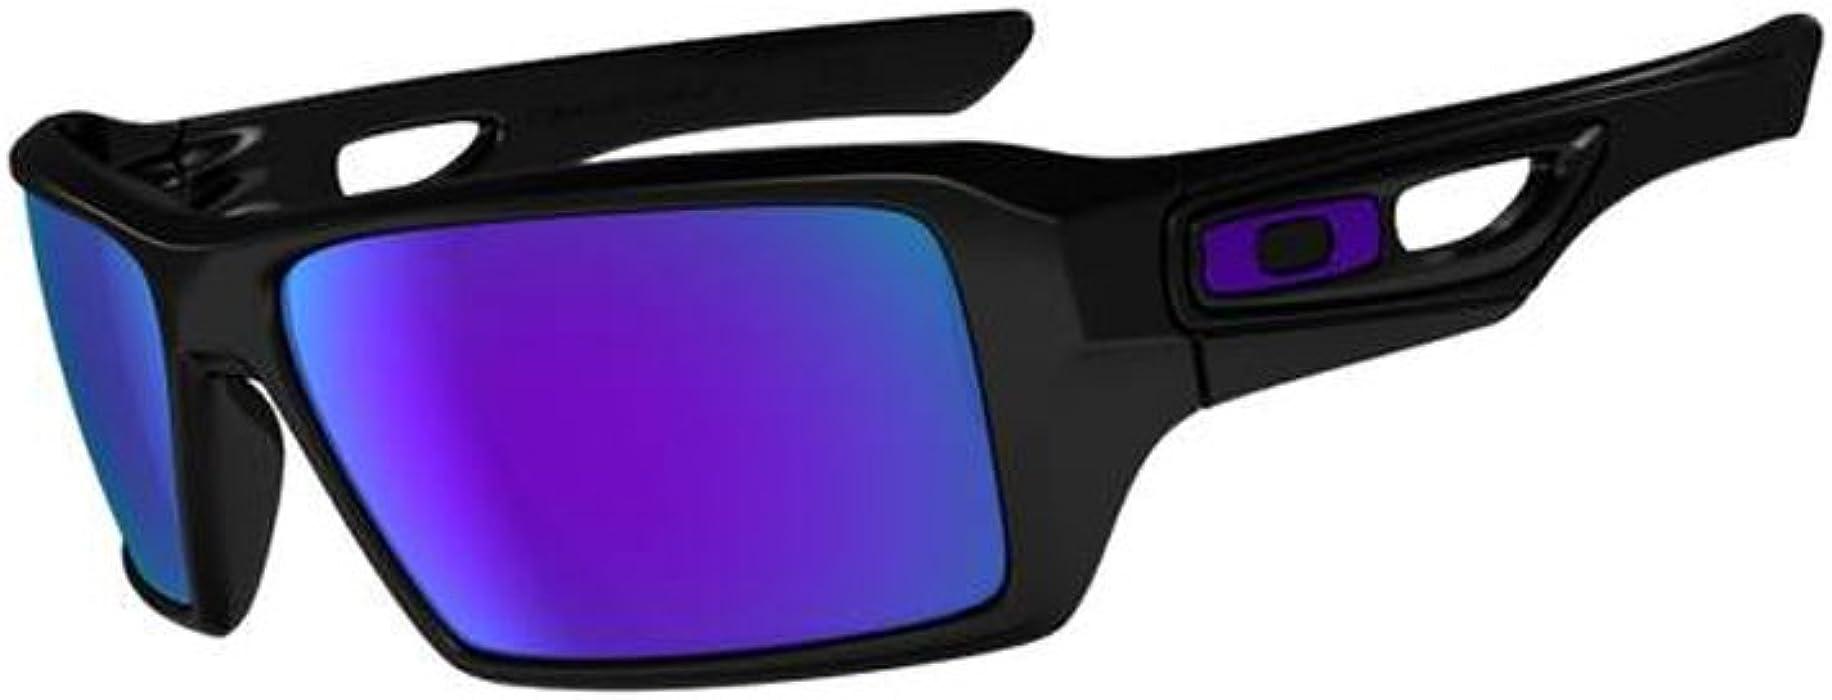 b61132c386 Oakley Sonnenbrille Eyepatch 2 Polished Black Violet Iridium oo9136 ...